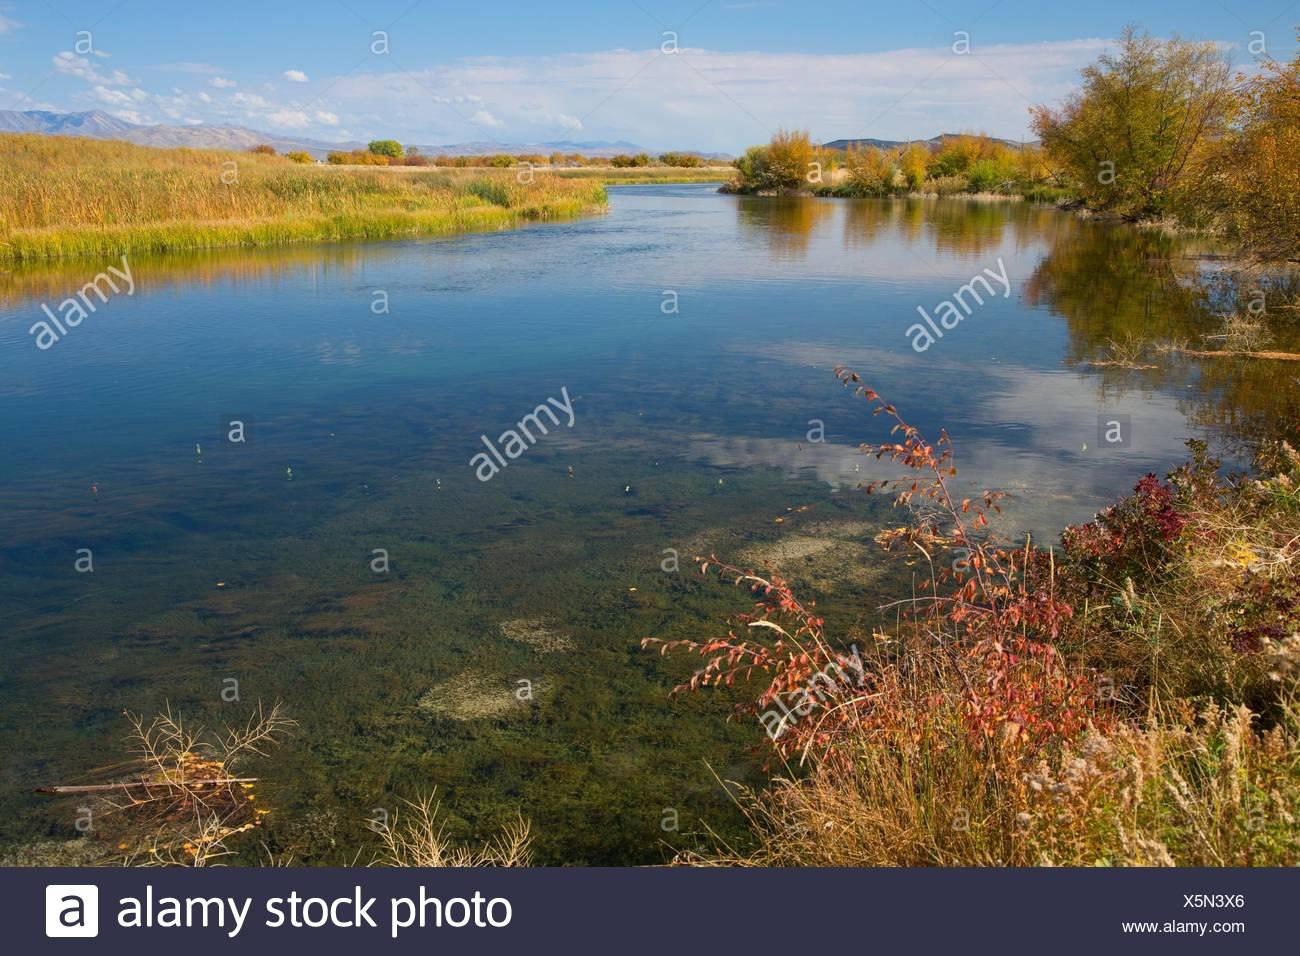 Silver Creek, Silver Creek Preserve, Idaho. - Stock Image